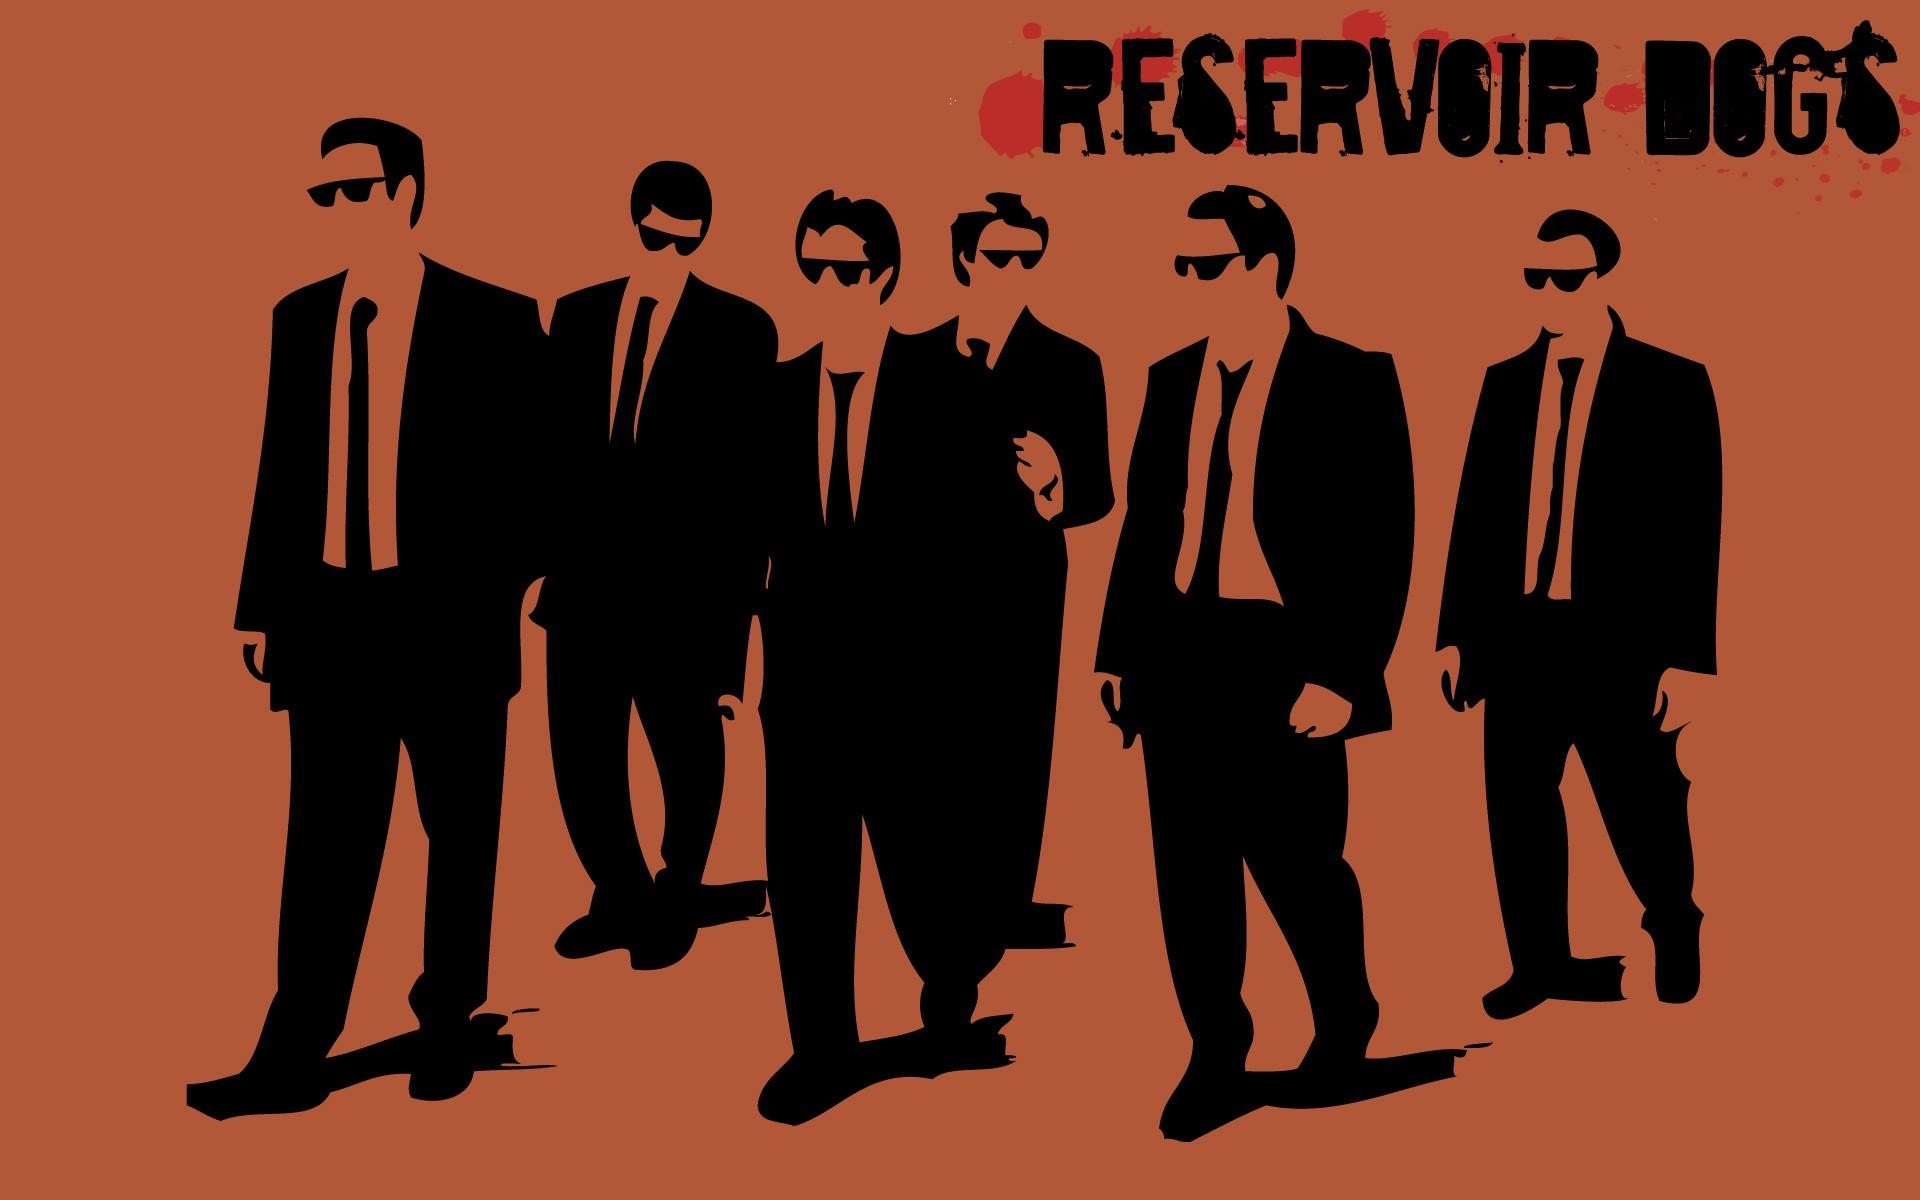 Reservoir Dogs download wallpaper